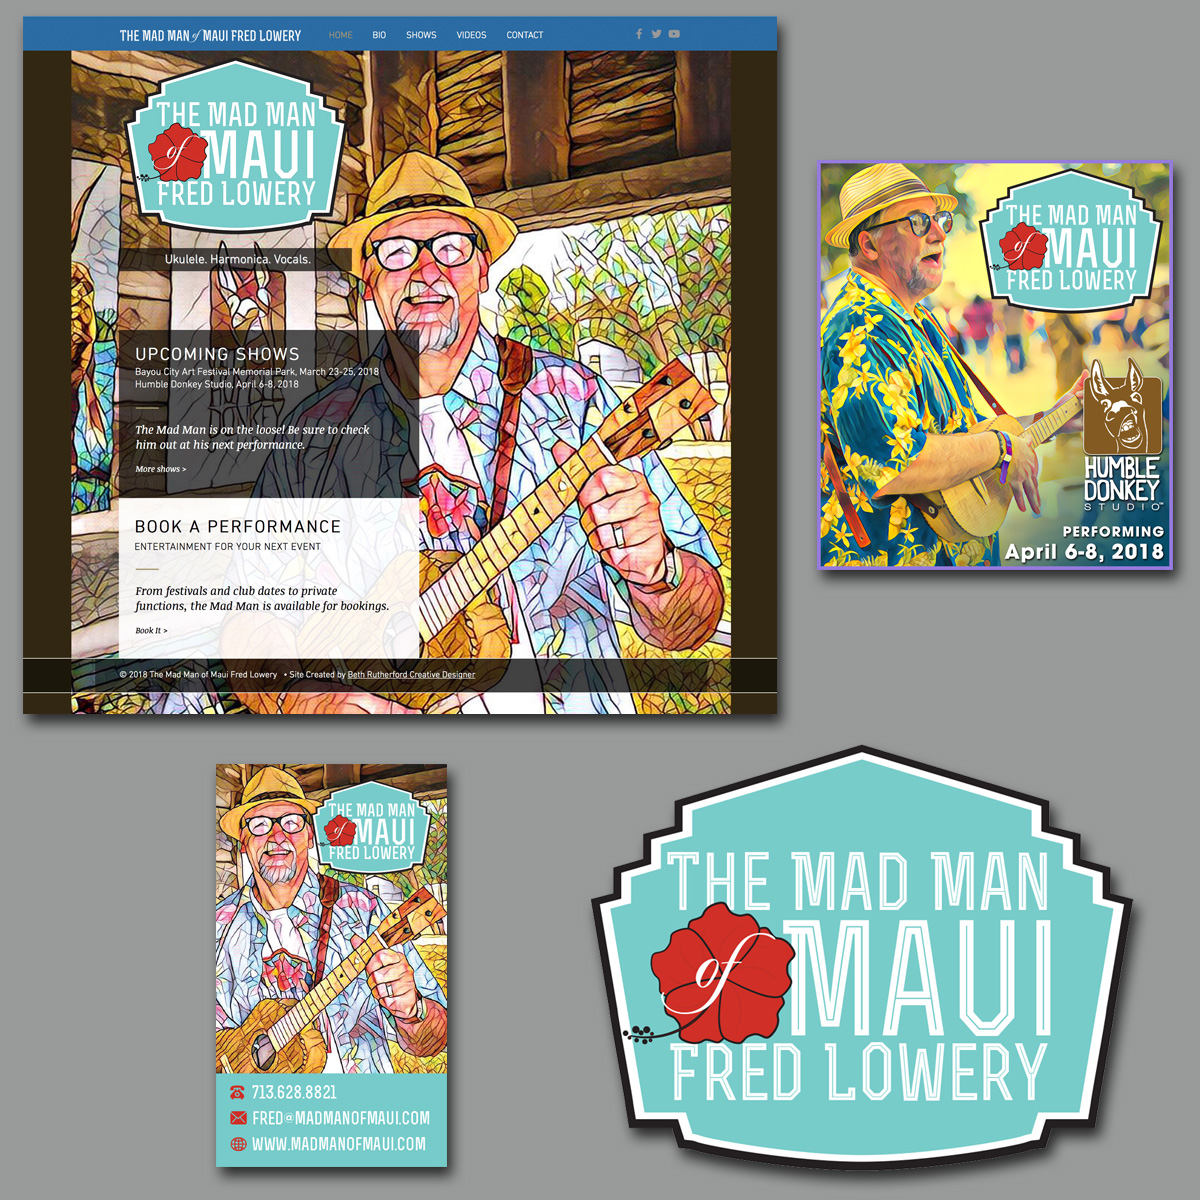 Creative Designer   Mad Man of Maui Fred Lowery